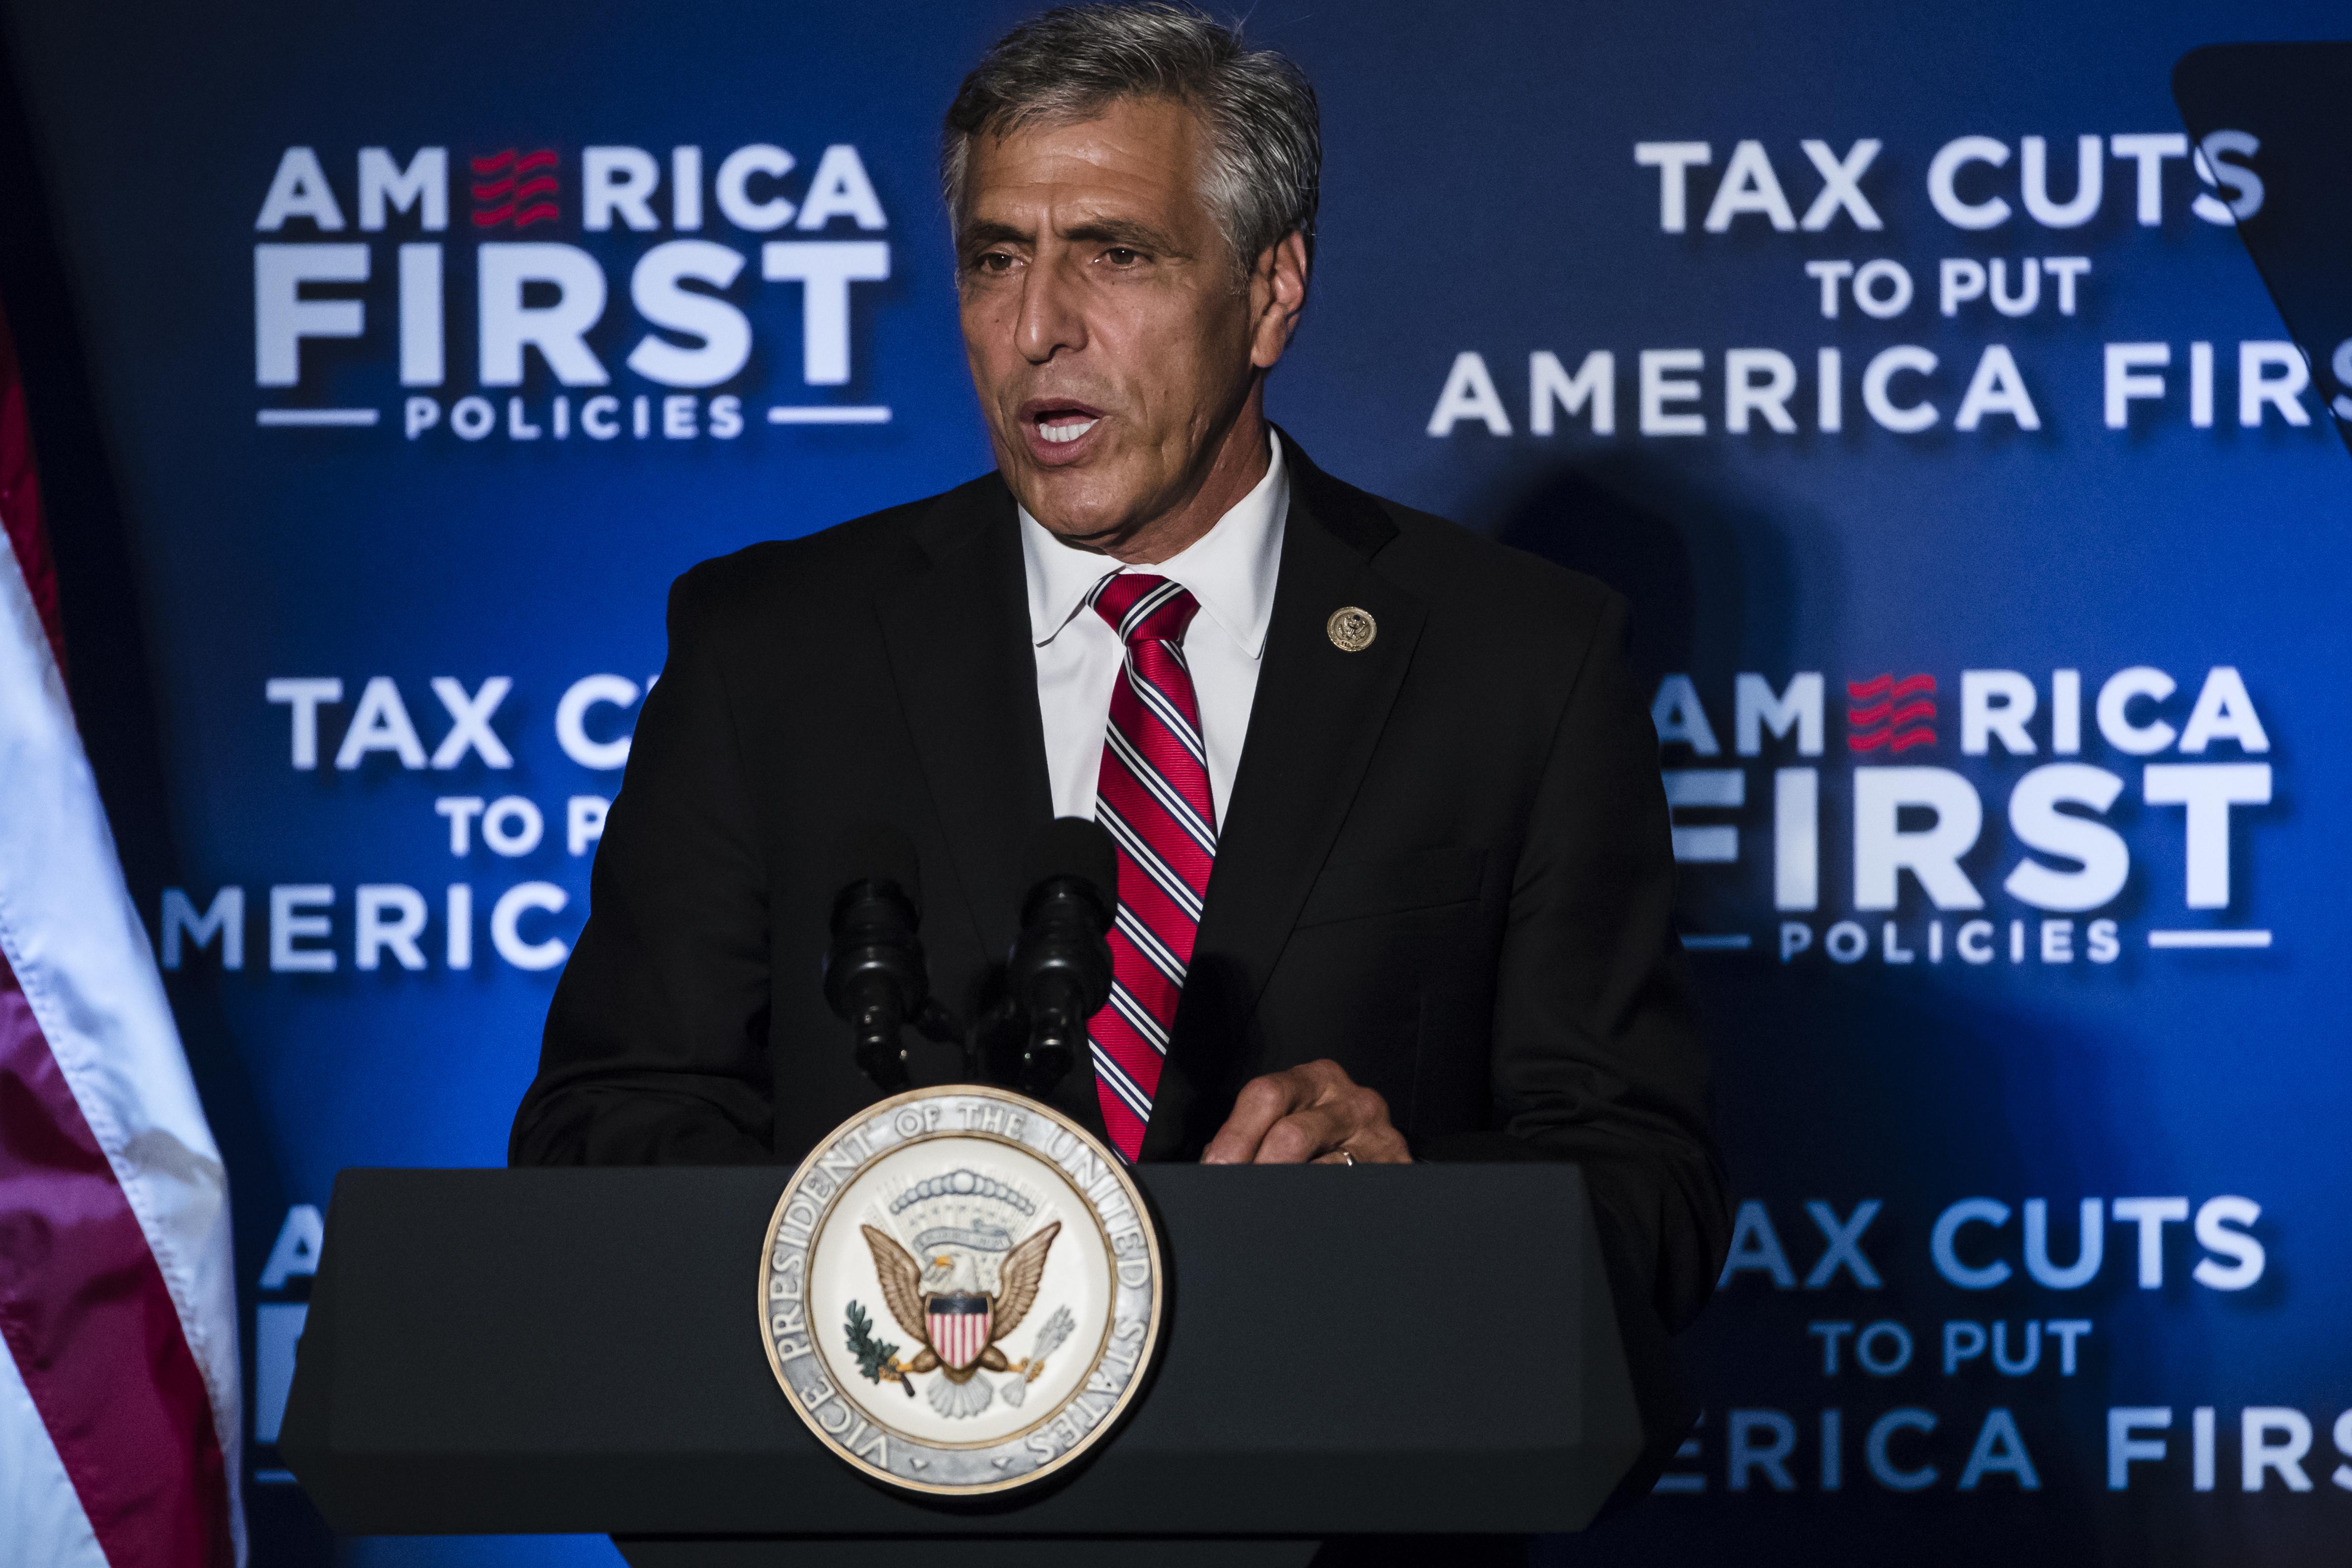 Republican U.S. Senate candidate Rep. Lou Barletta, R-Pa., speaks at an America First Policies event in Philadelphia, Monday, July 23, 2018.